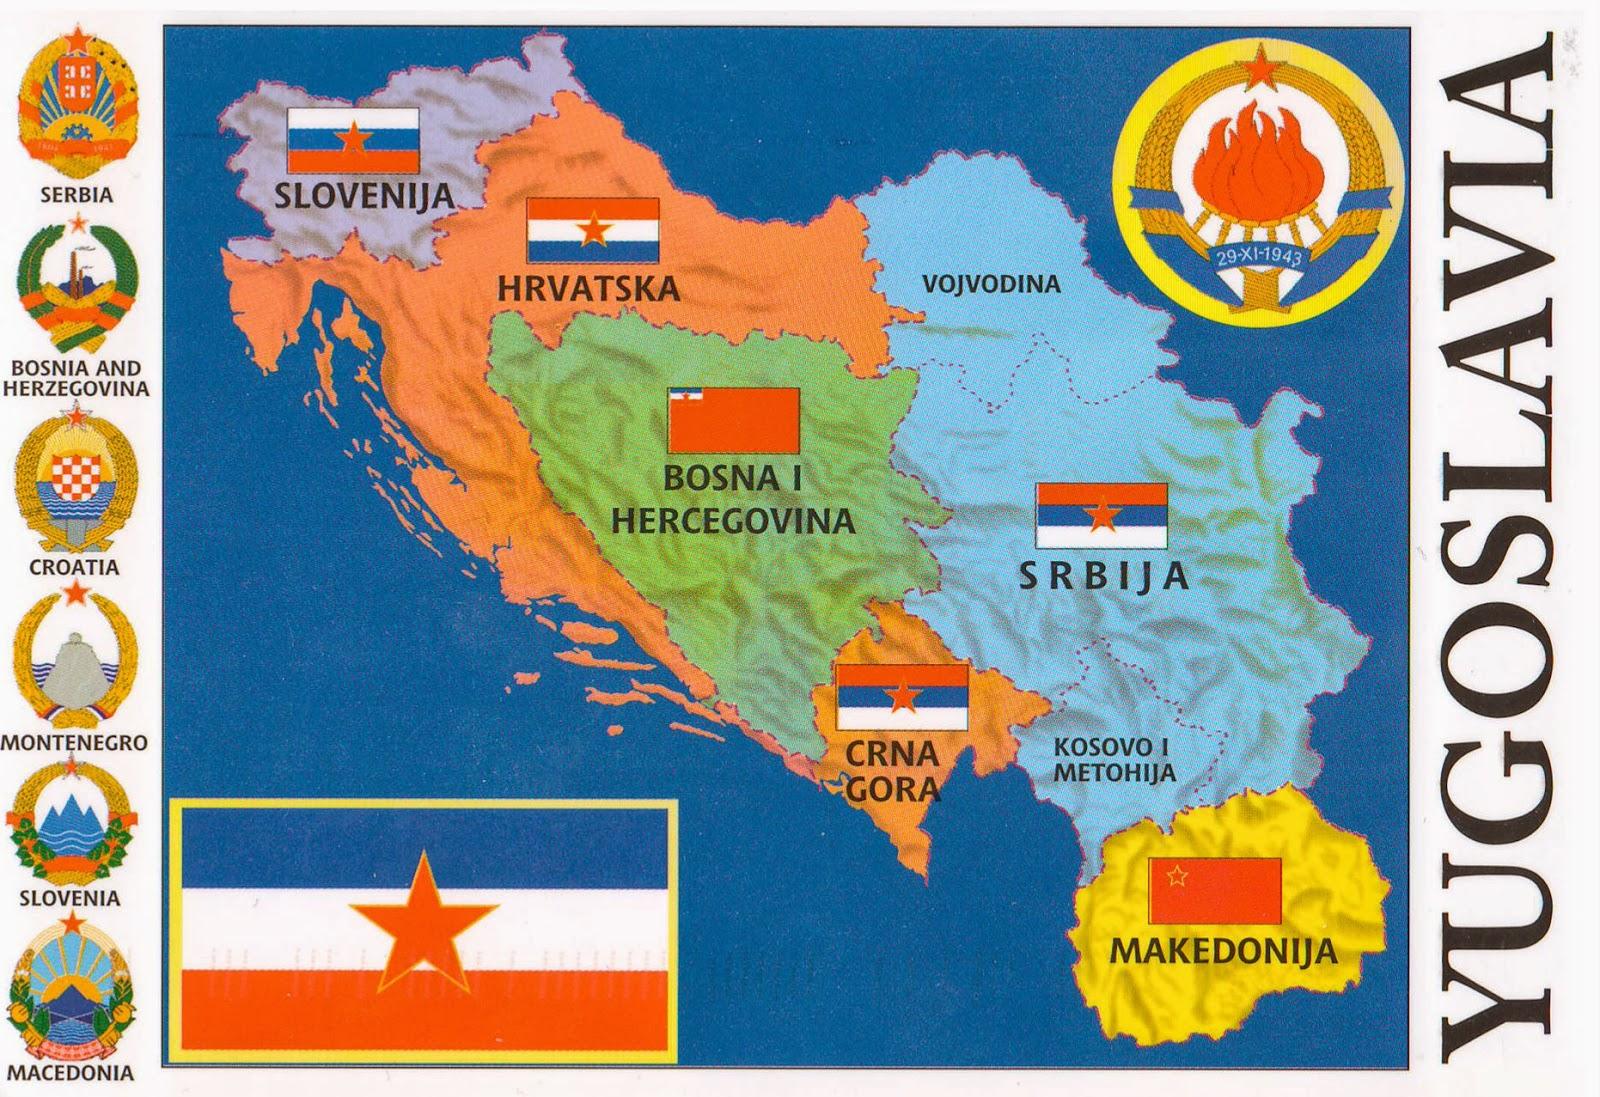 One postcard one world yugoslavia map postcard from serbia yugoslavia map postcard from serbia gumiabroncs Choice Image